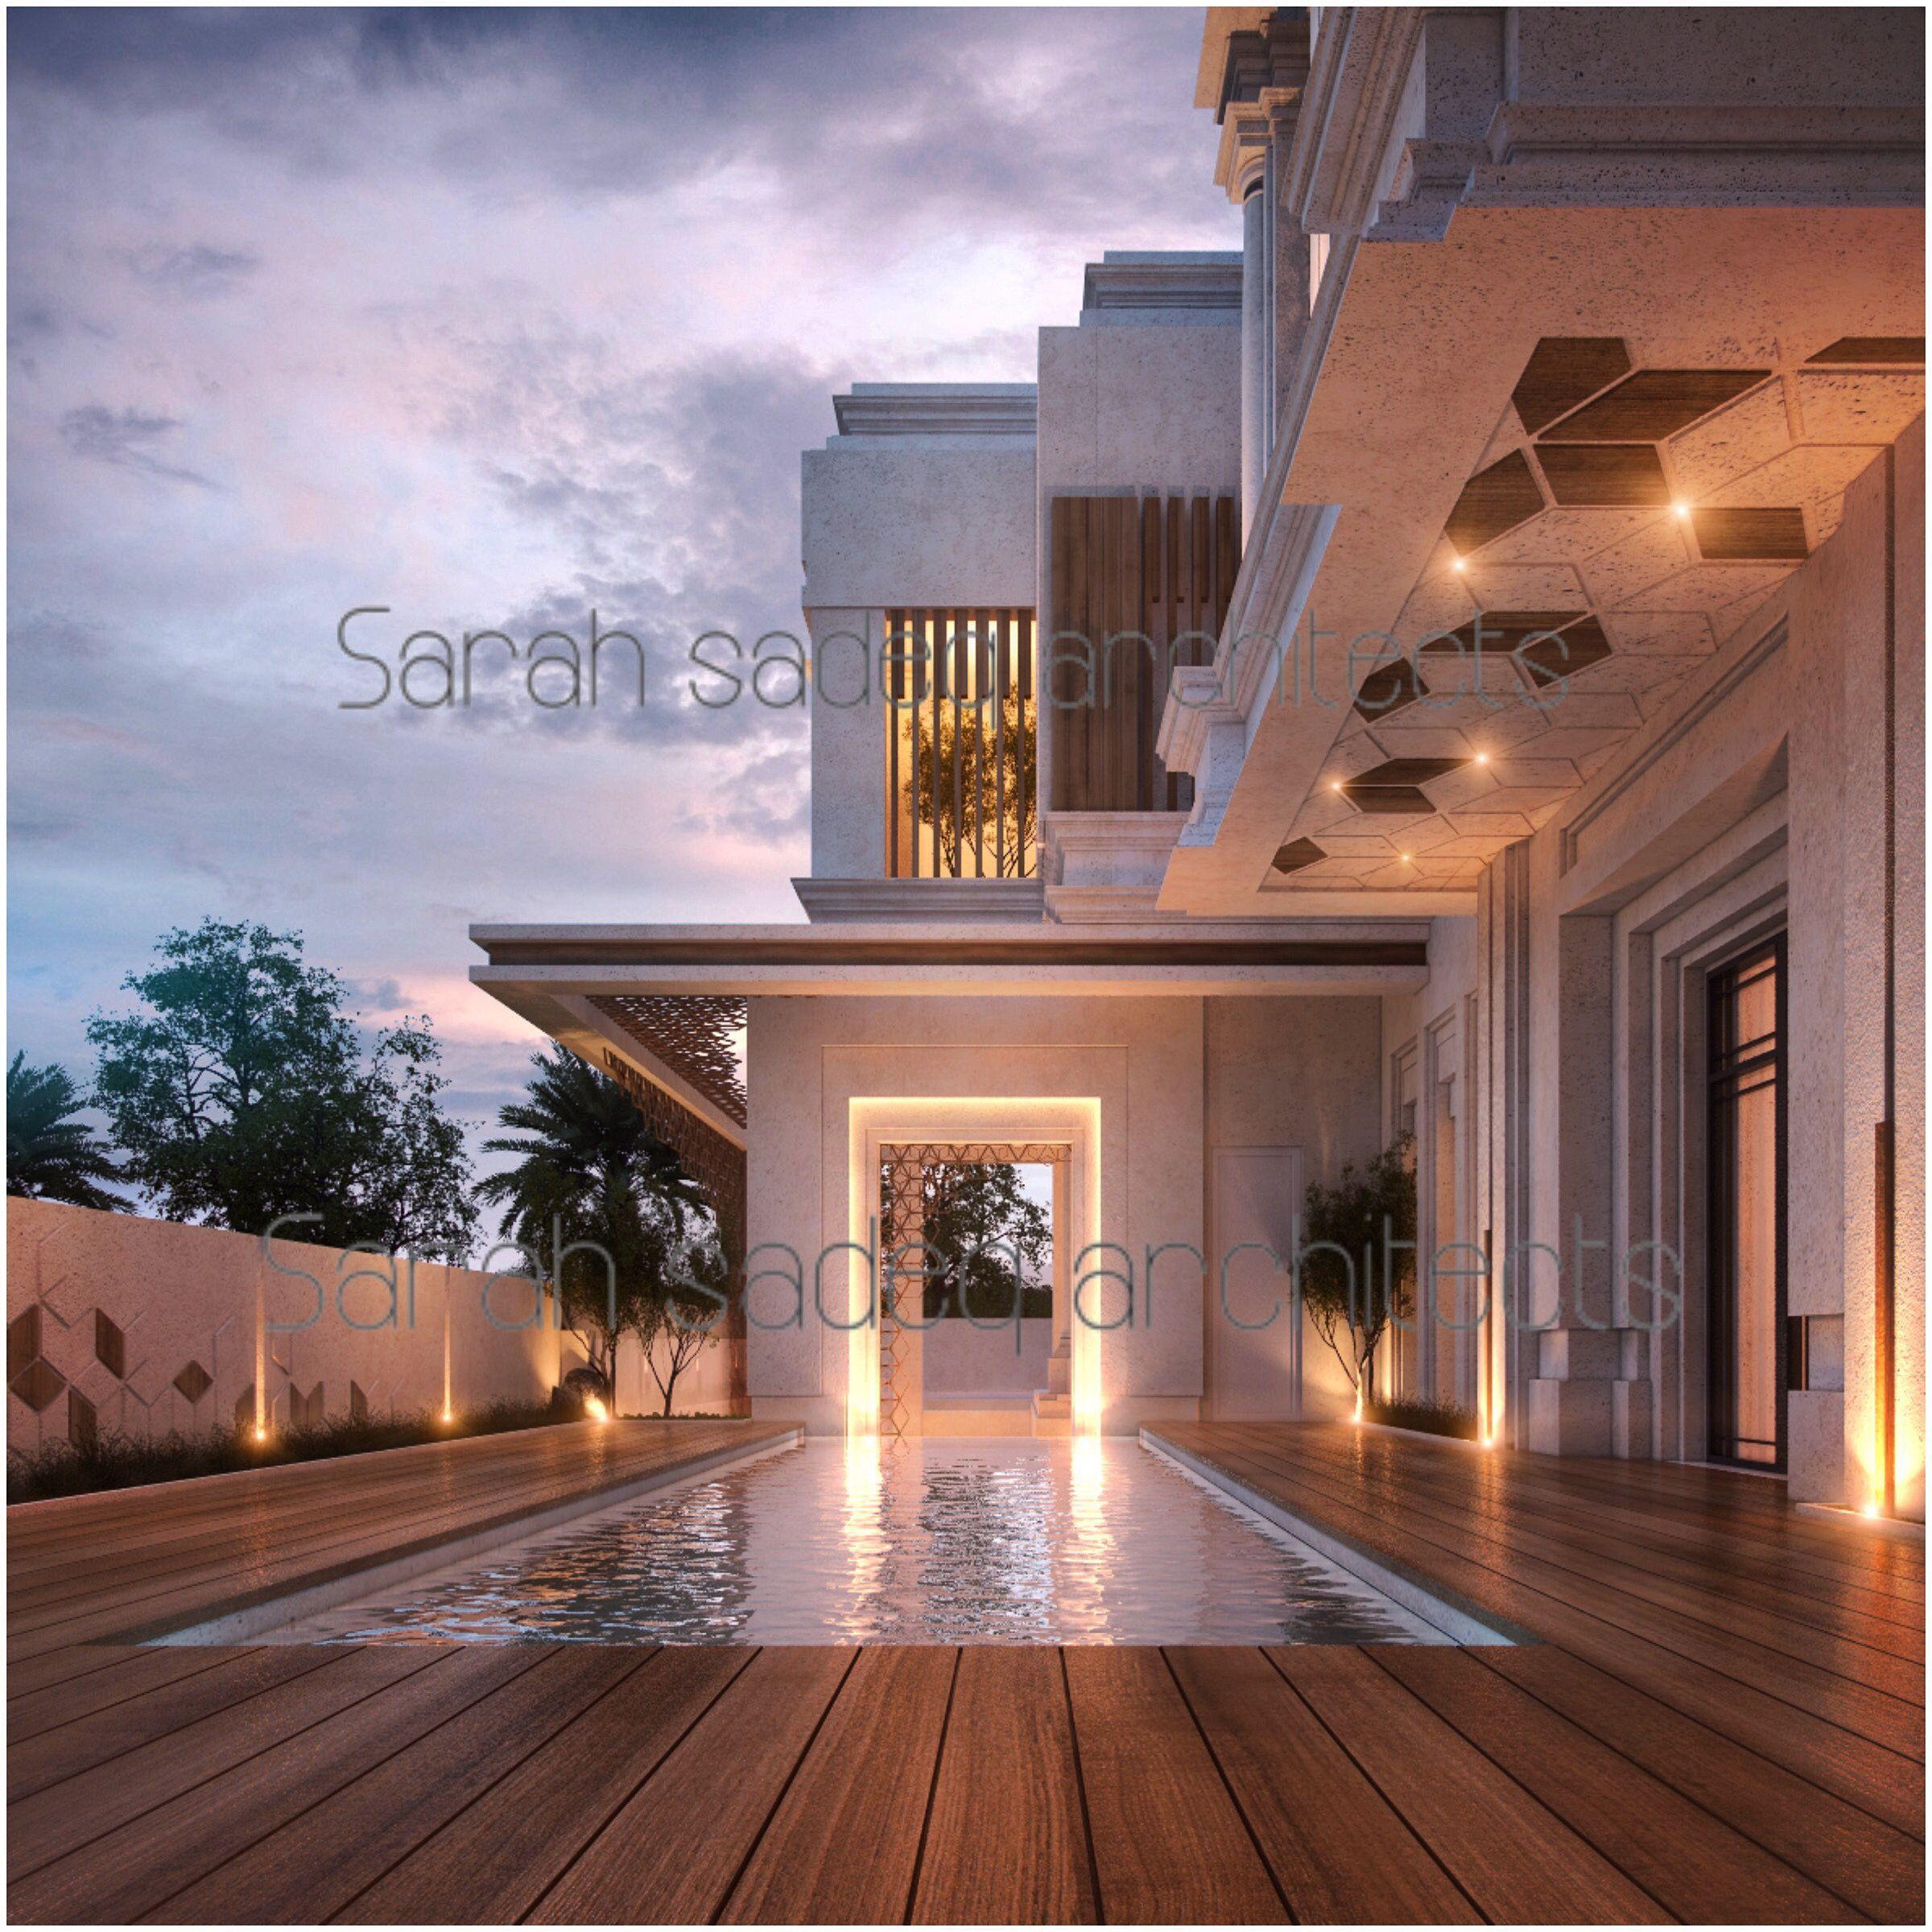 soon in uae by sarah sadeq architects dubai sarah sadeq architectes en 2018 pinterest. Black Bedroom Furniture Sets. Home Design Ideas